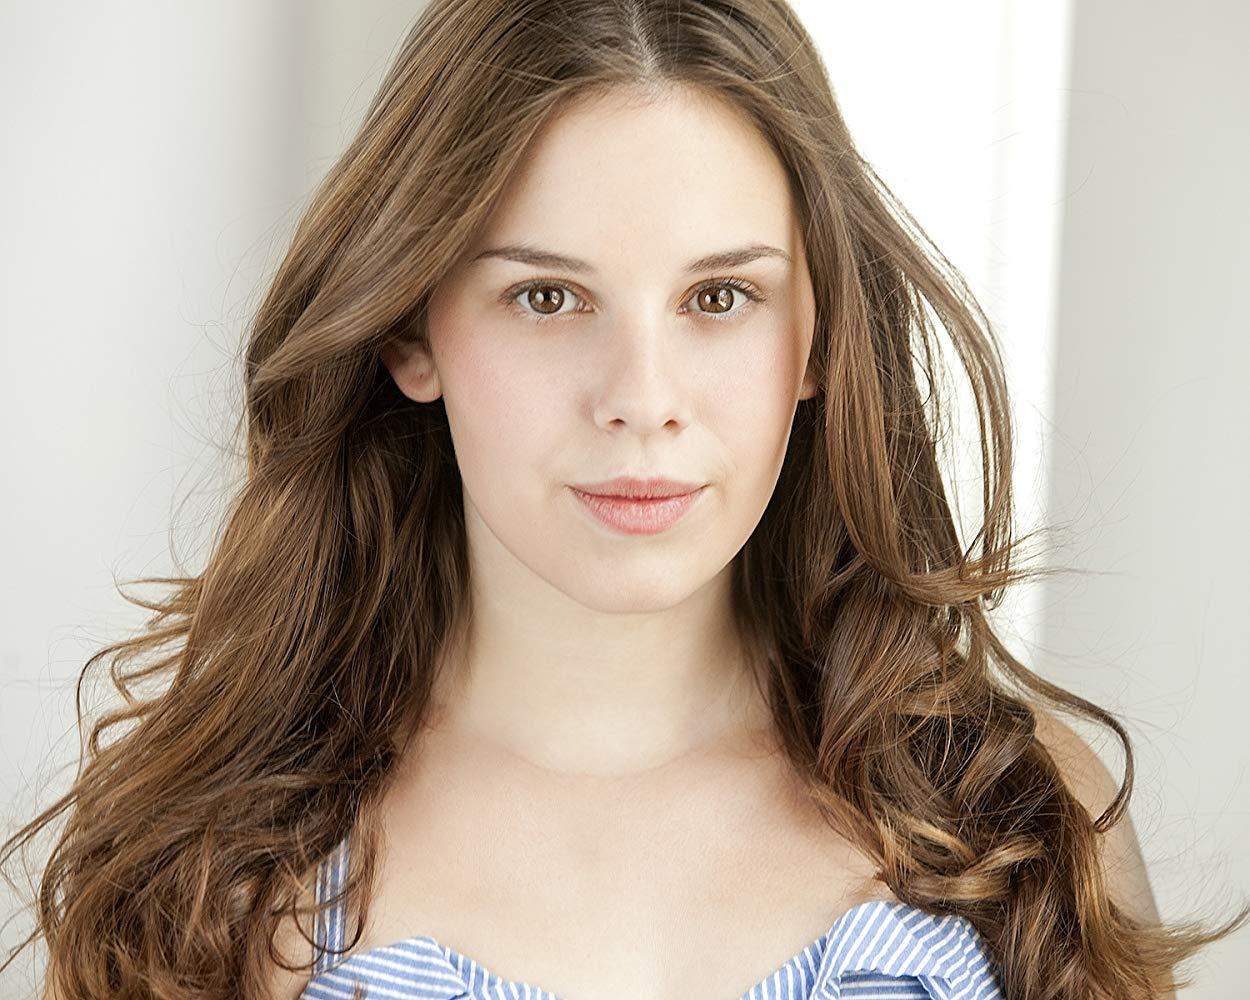 Sophia Franzella